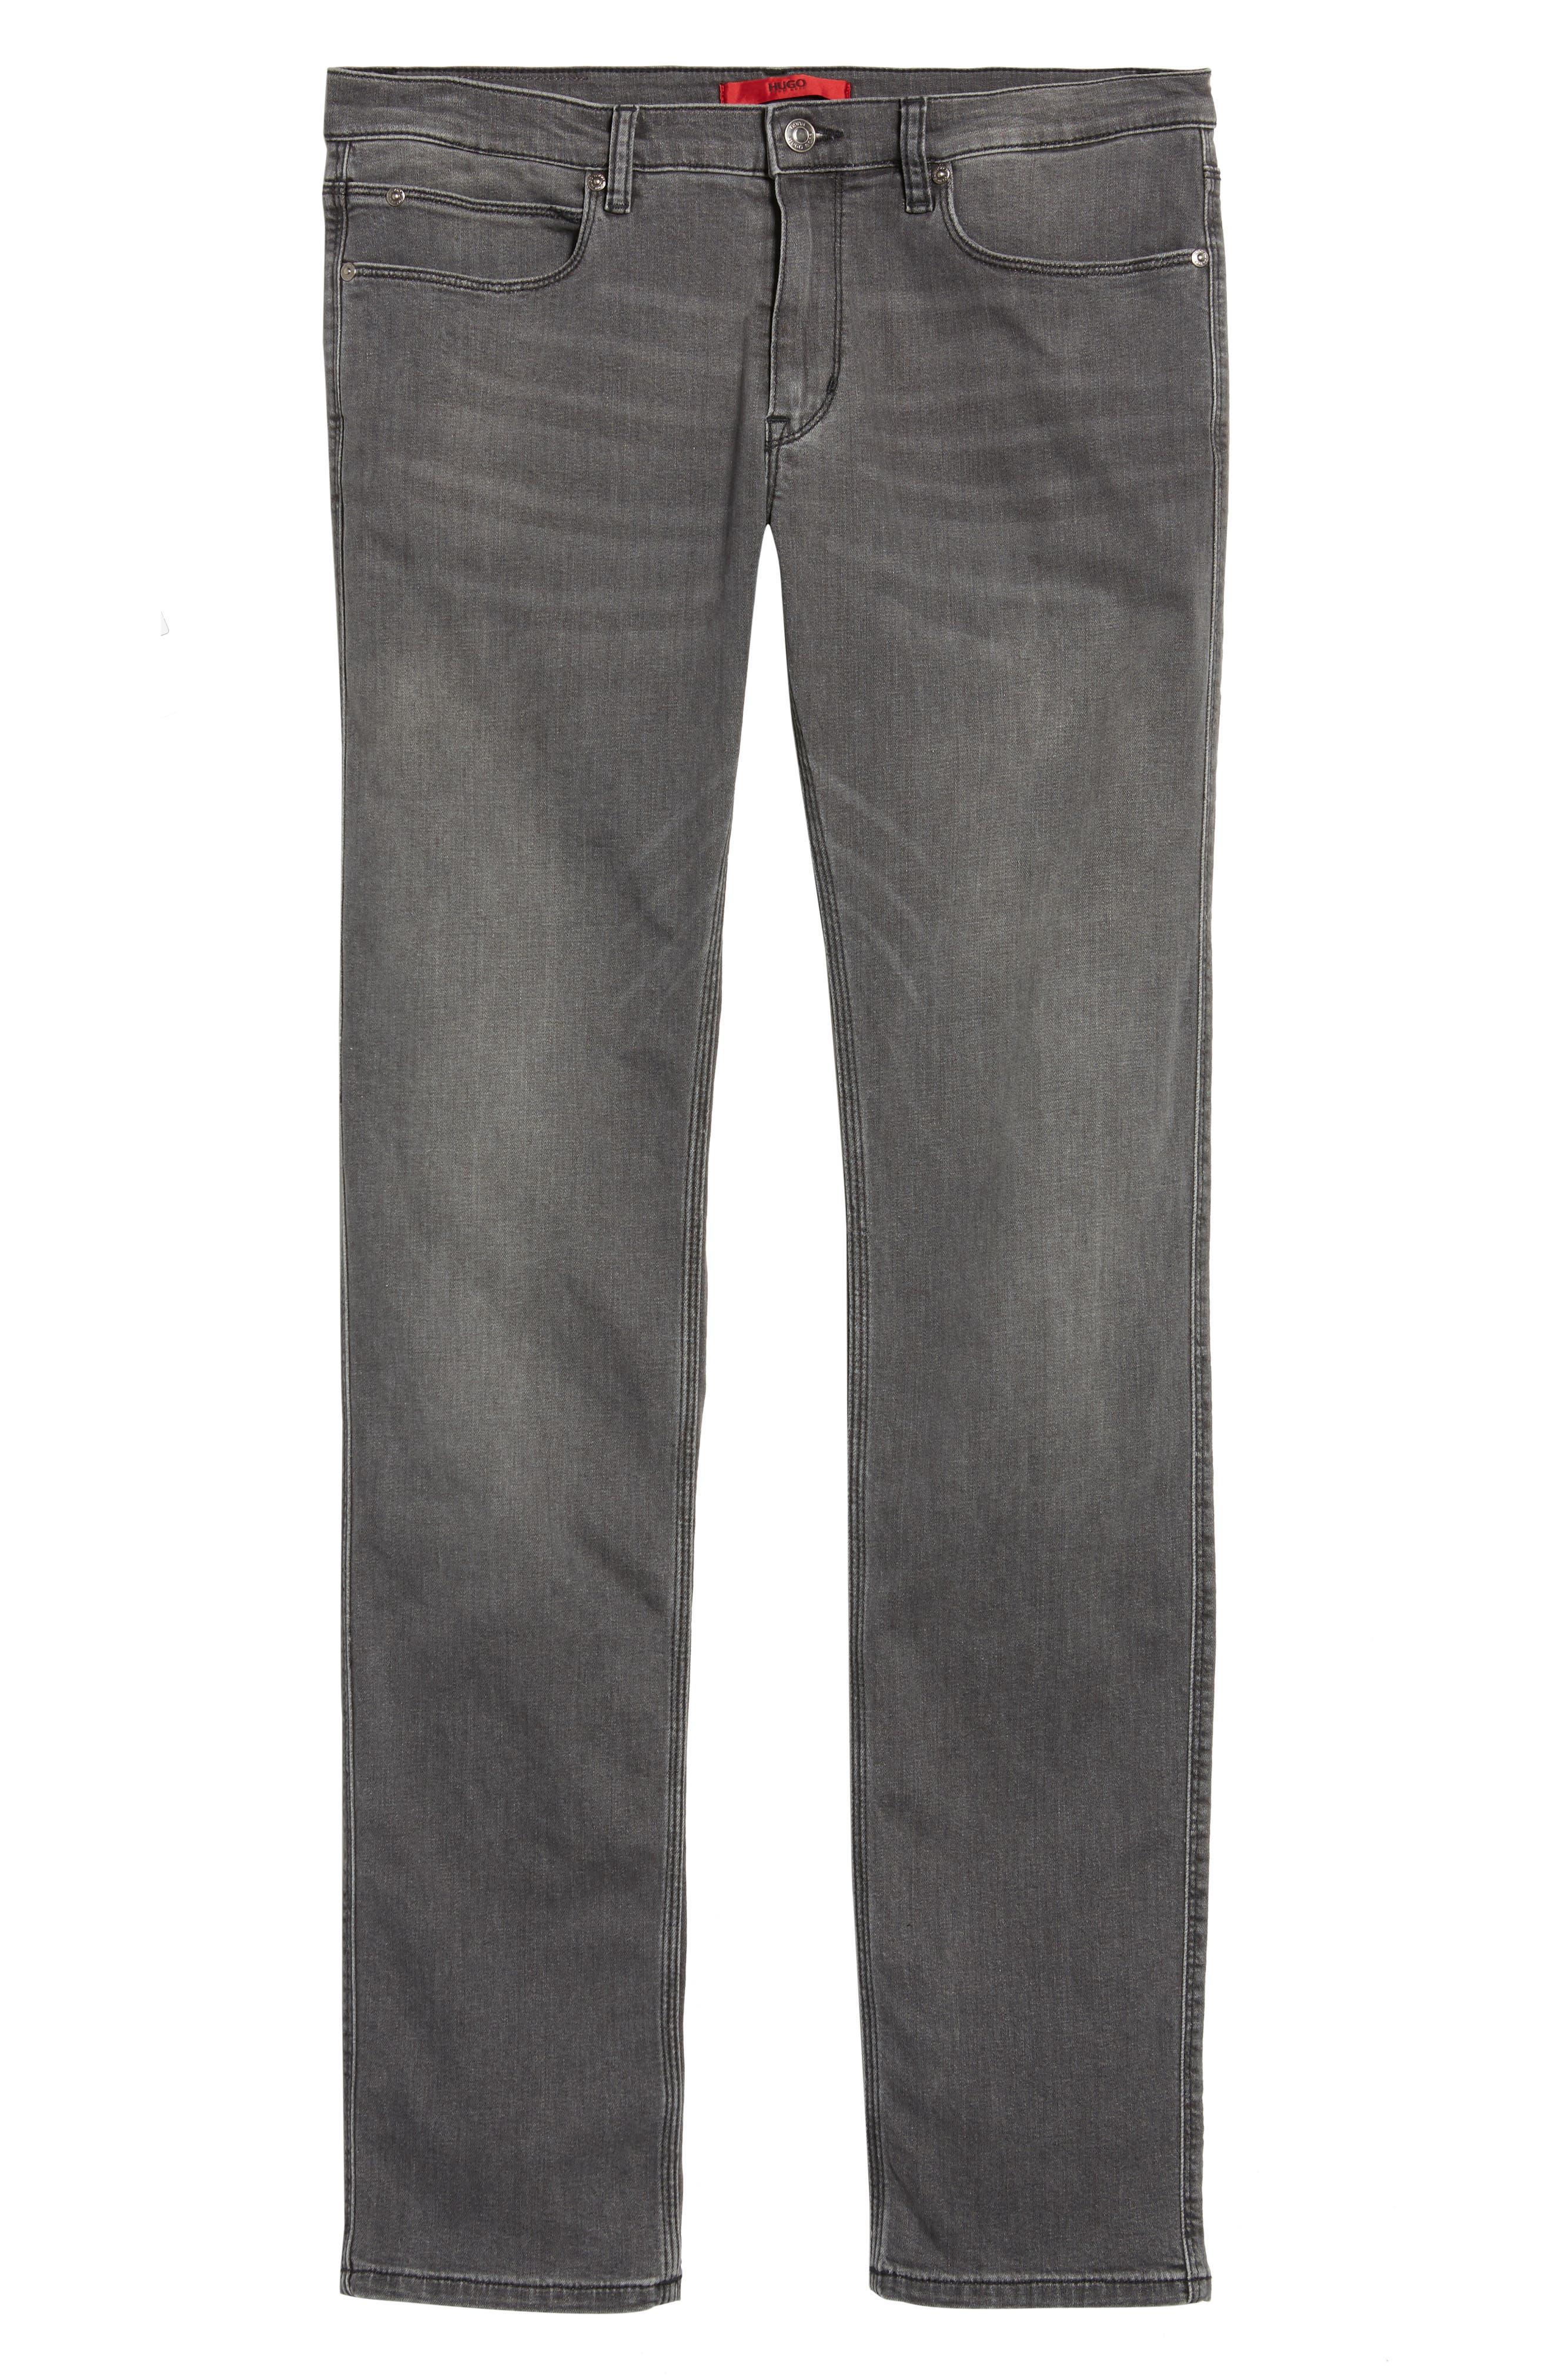 Hugo Boss 708 Stonewash Denim Jeans,                             Alternate thumbnail 6, color,                             021